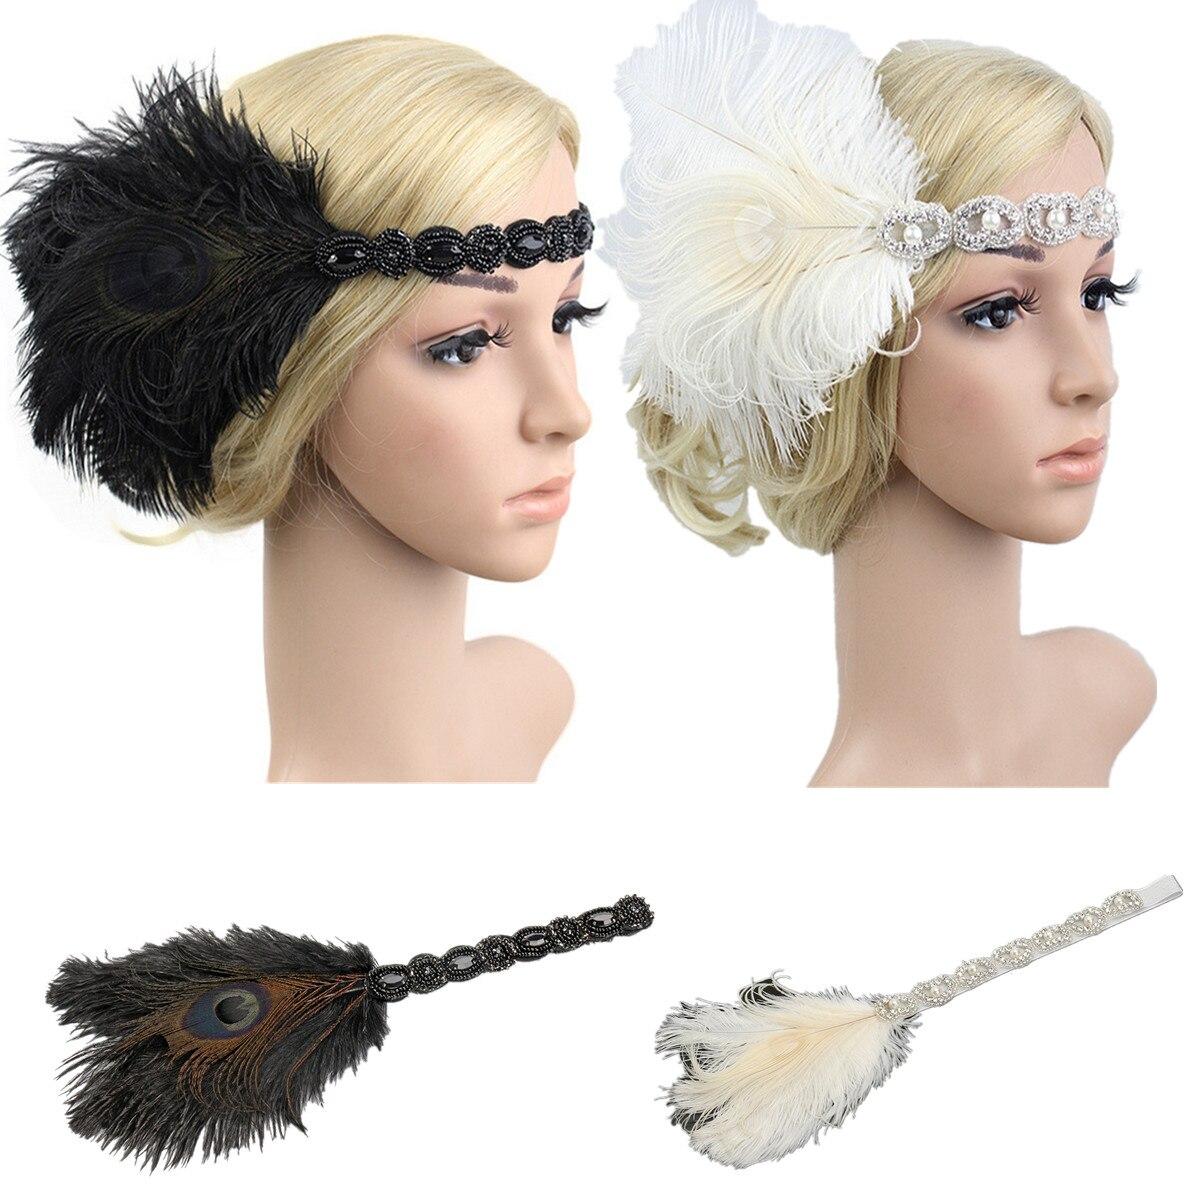 Vintage White Peacock Feather Headband Elastic Band Flapper Headpiece